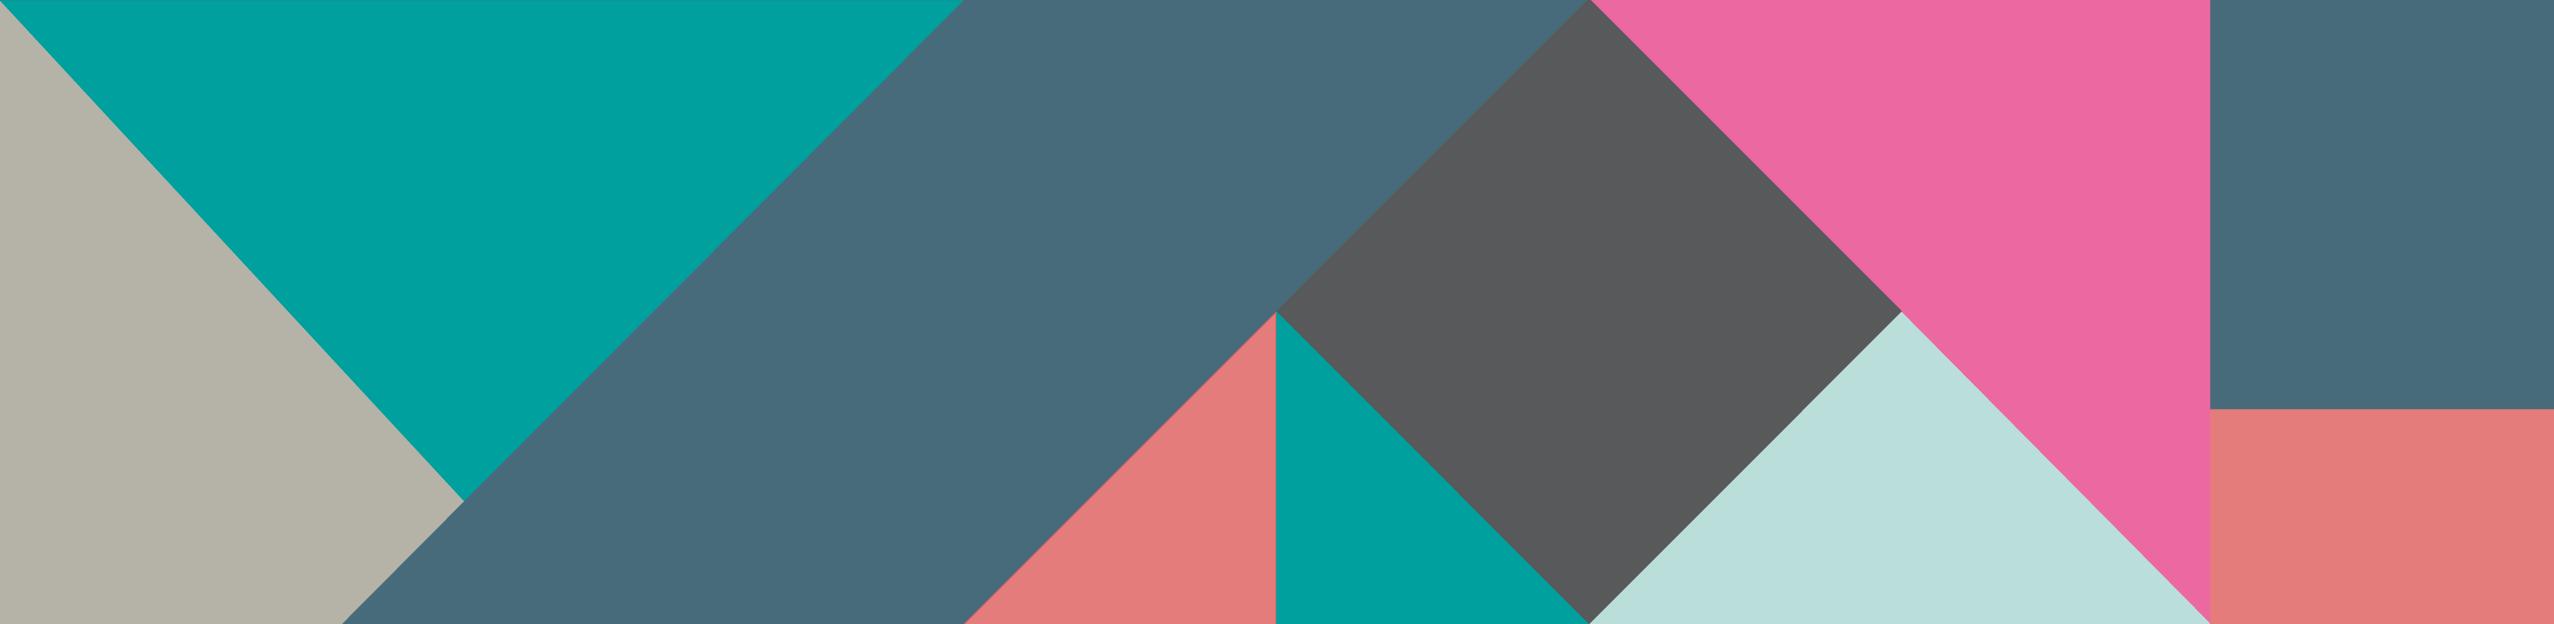 The Wallrus - Web & Print Design